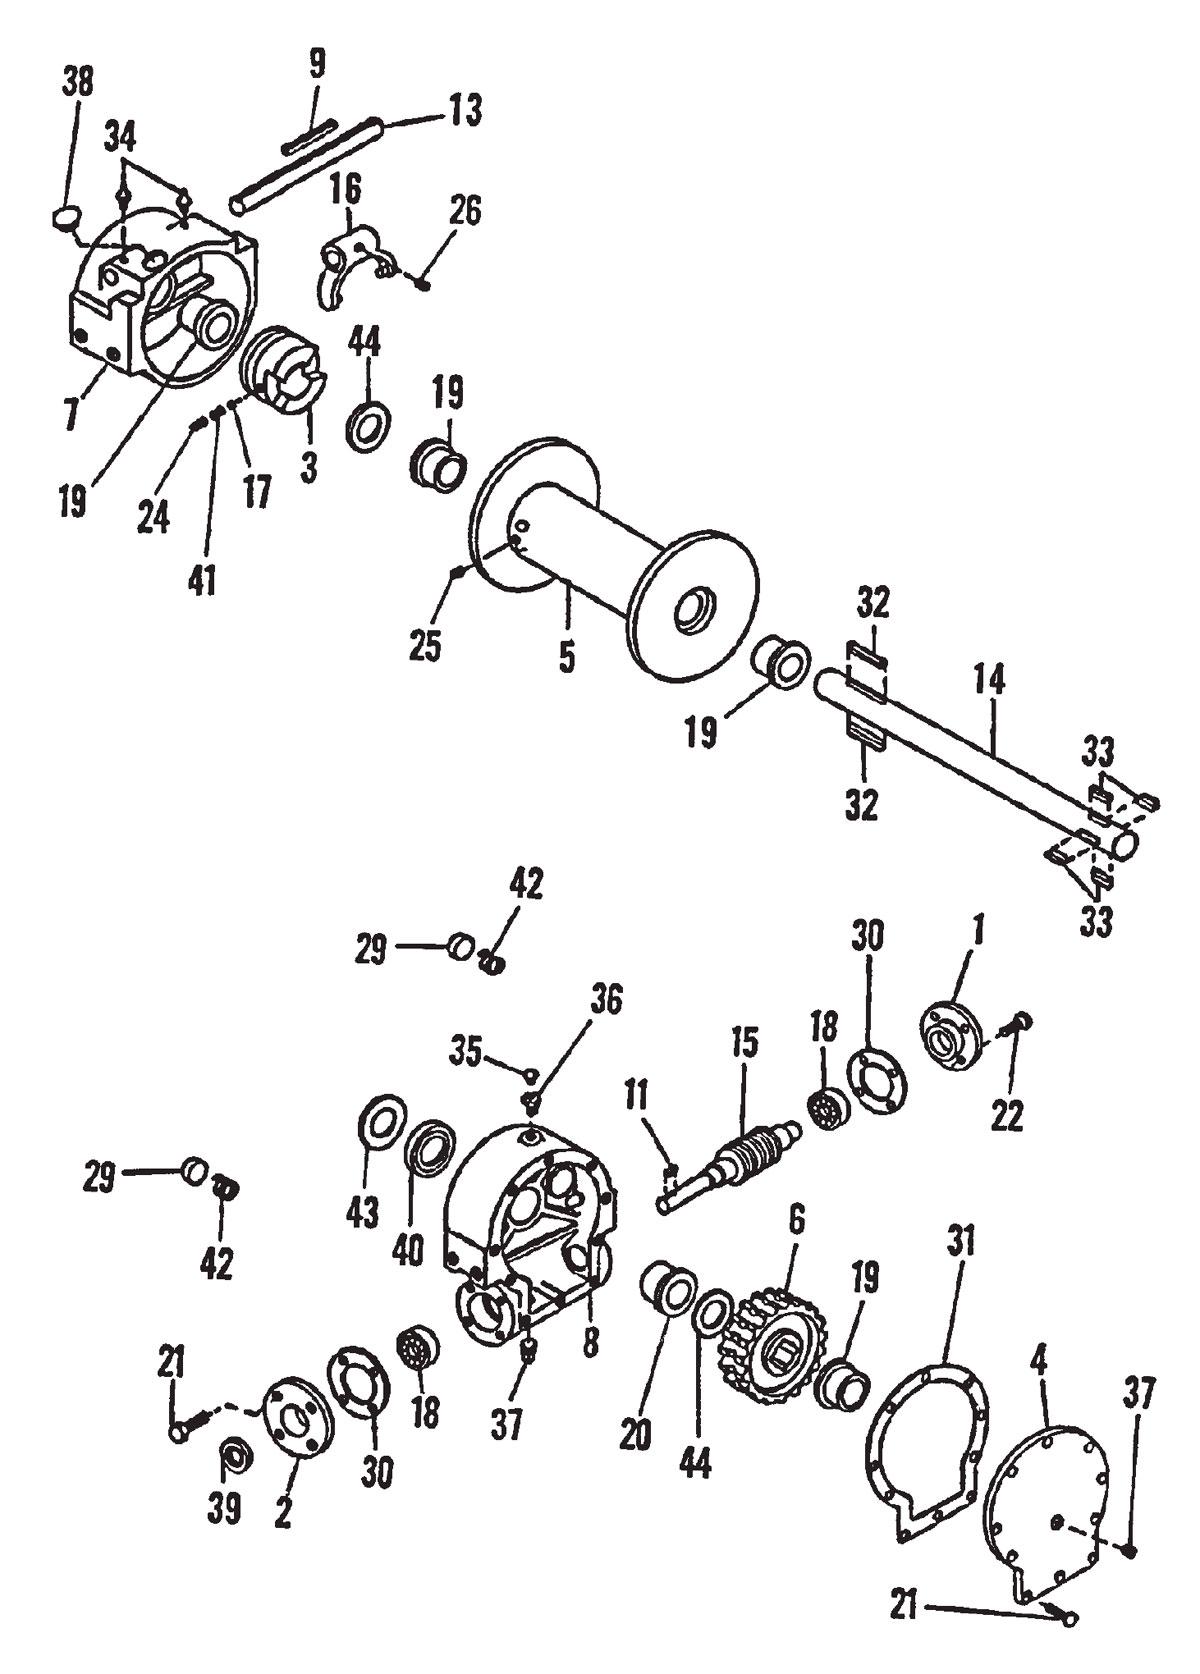 Wiring Ramsey Diagram Winch Dcs 200r - Dolgular.com